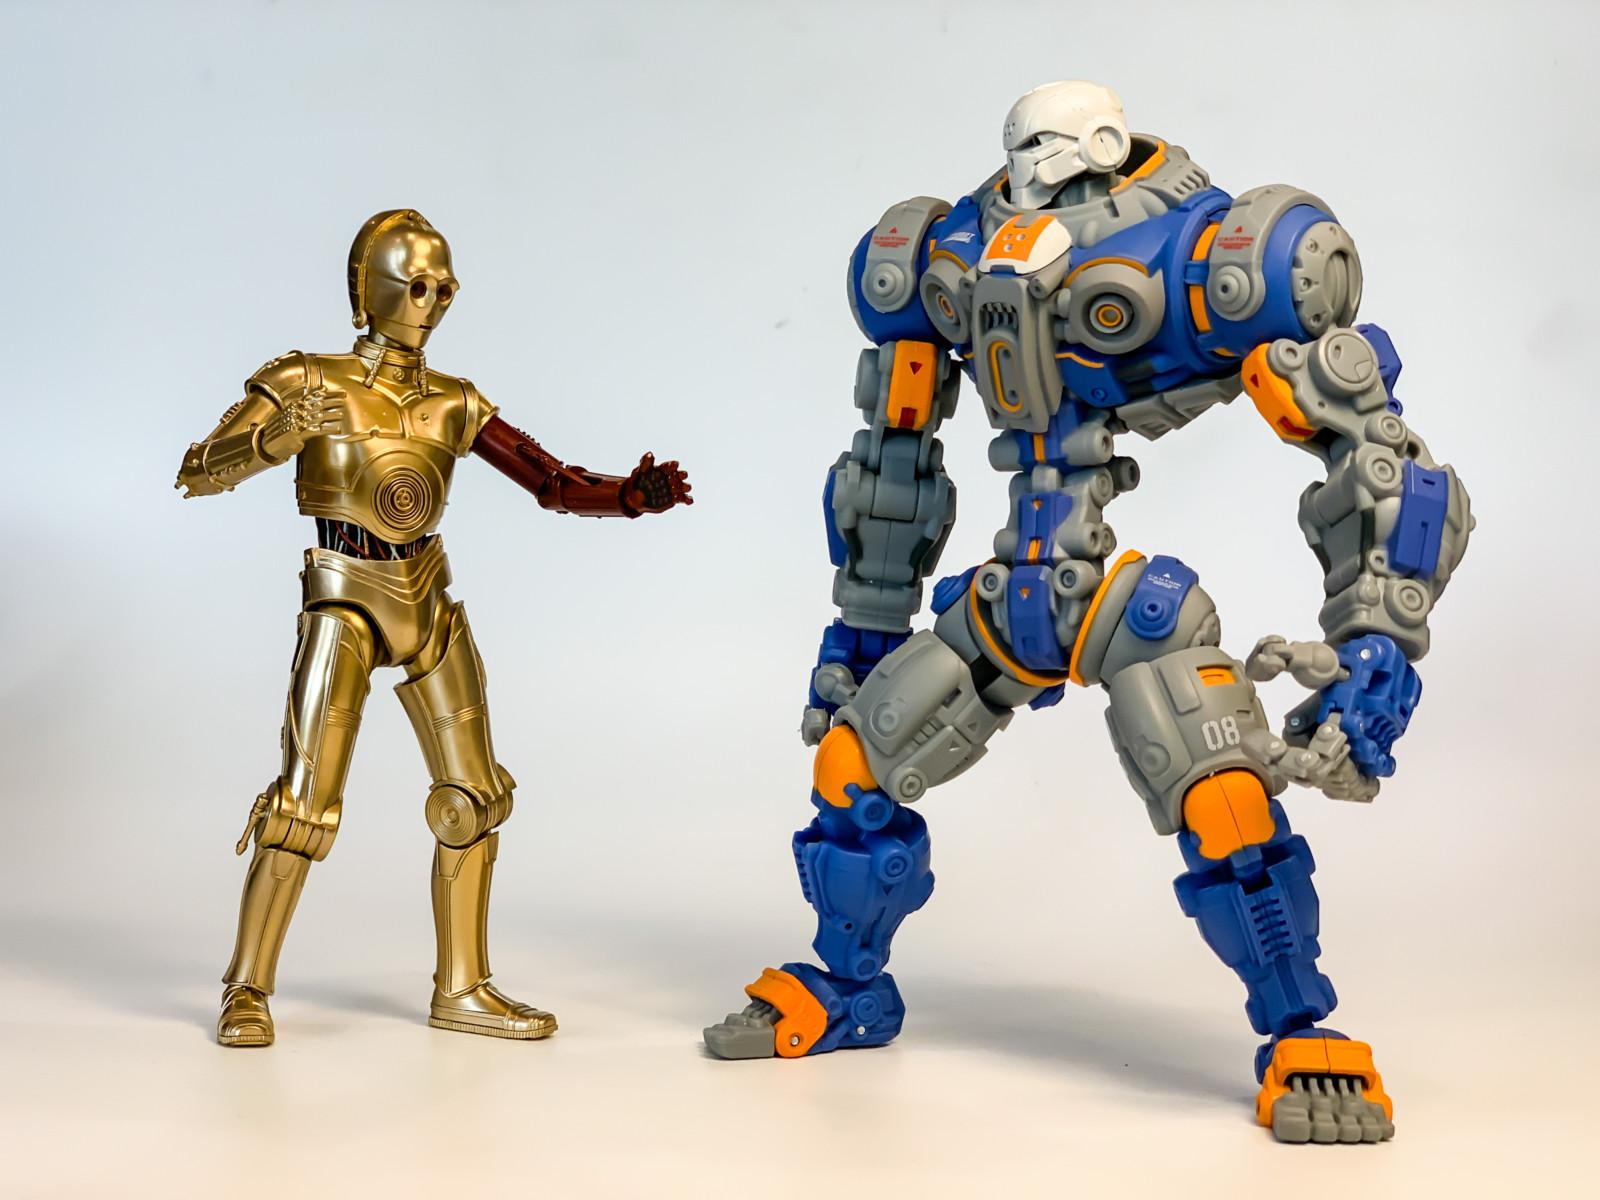 Toynotch astrobots apolloレビュー